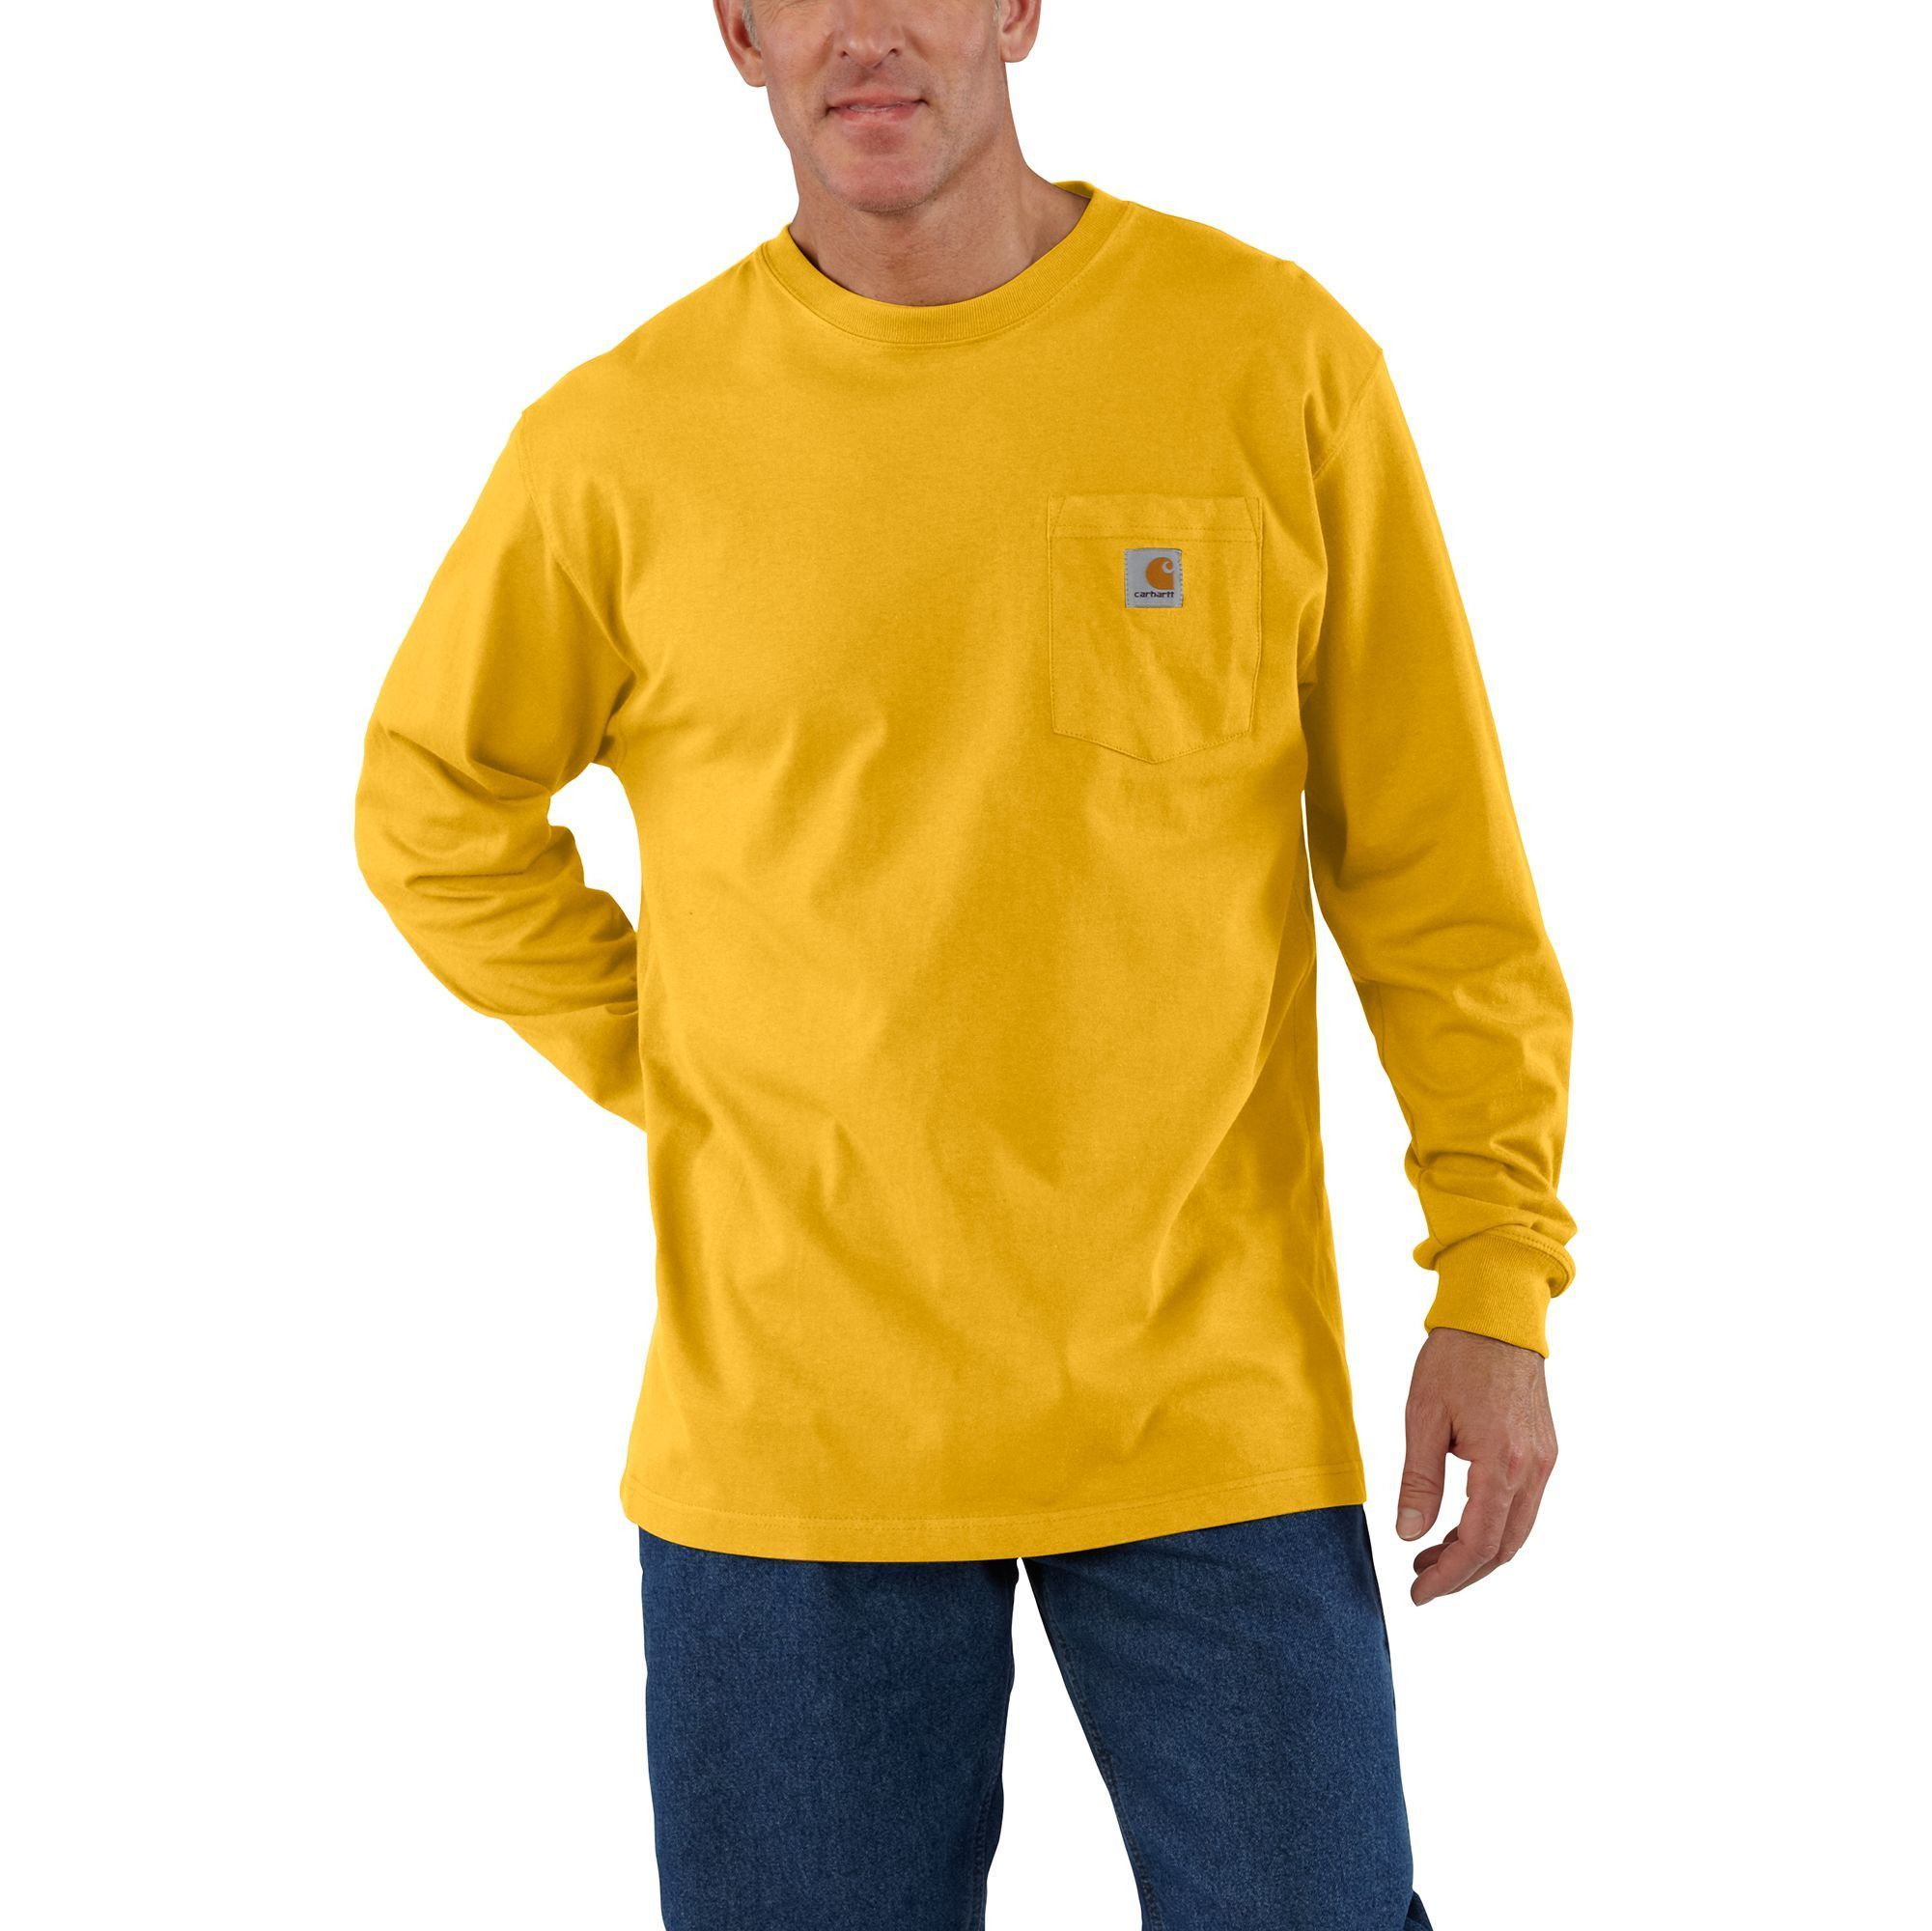 Heather Grey Long Sleeve Workwear Crewneck T-Shirt Carhartt K126